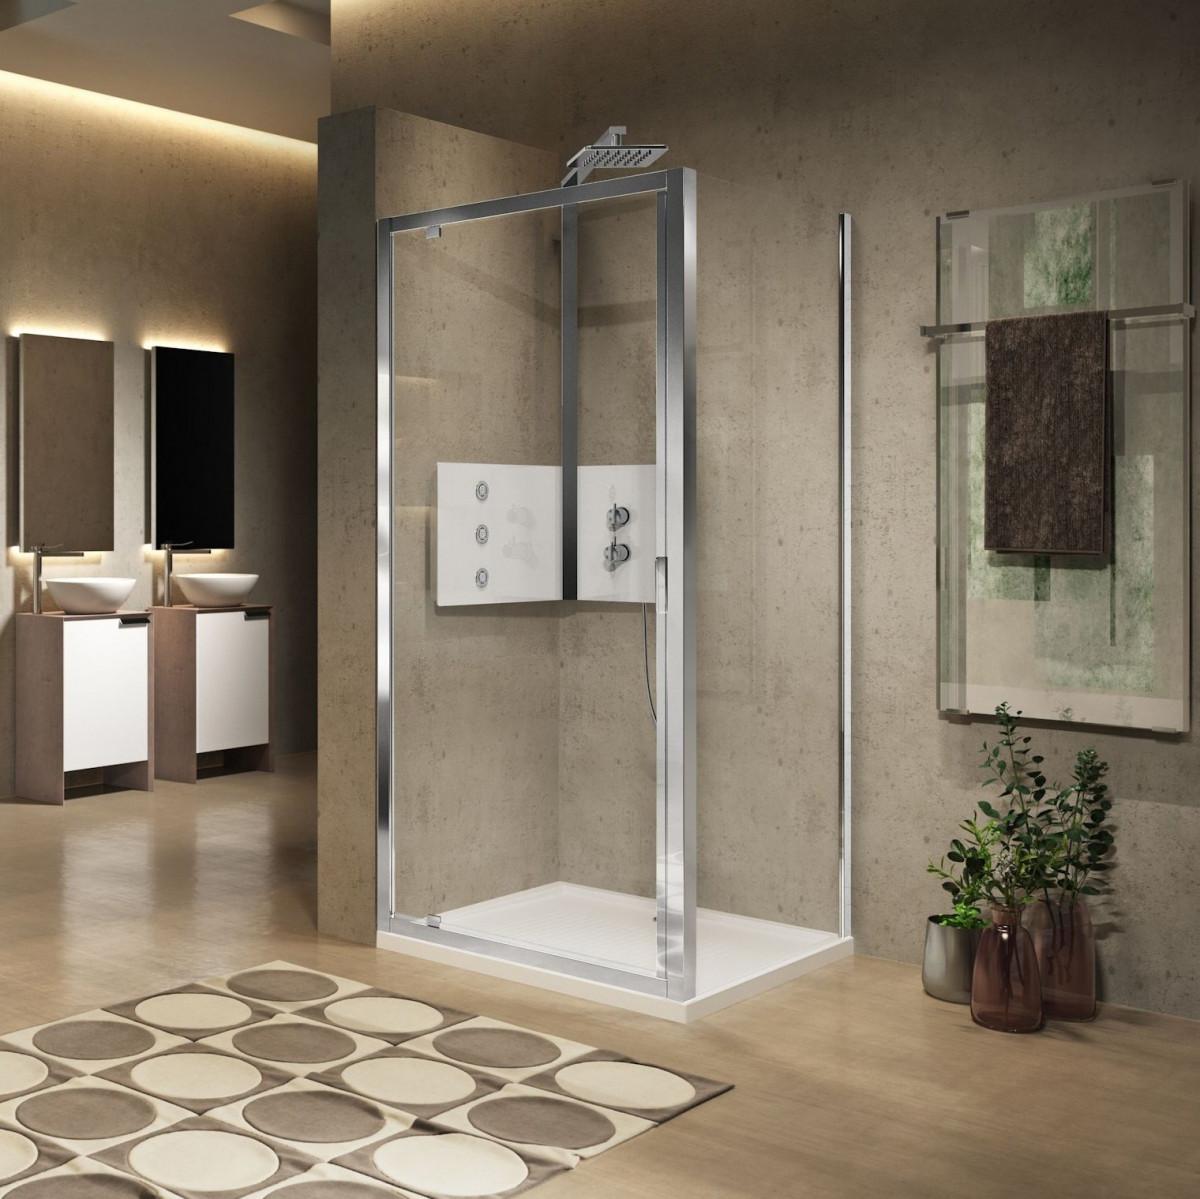 Novellini lunes 2 0 g pivot shower door 700mm lung66 1a for Novellini shower doors